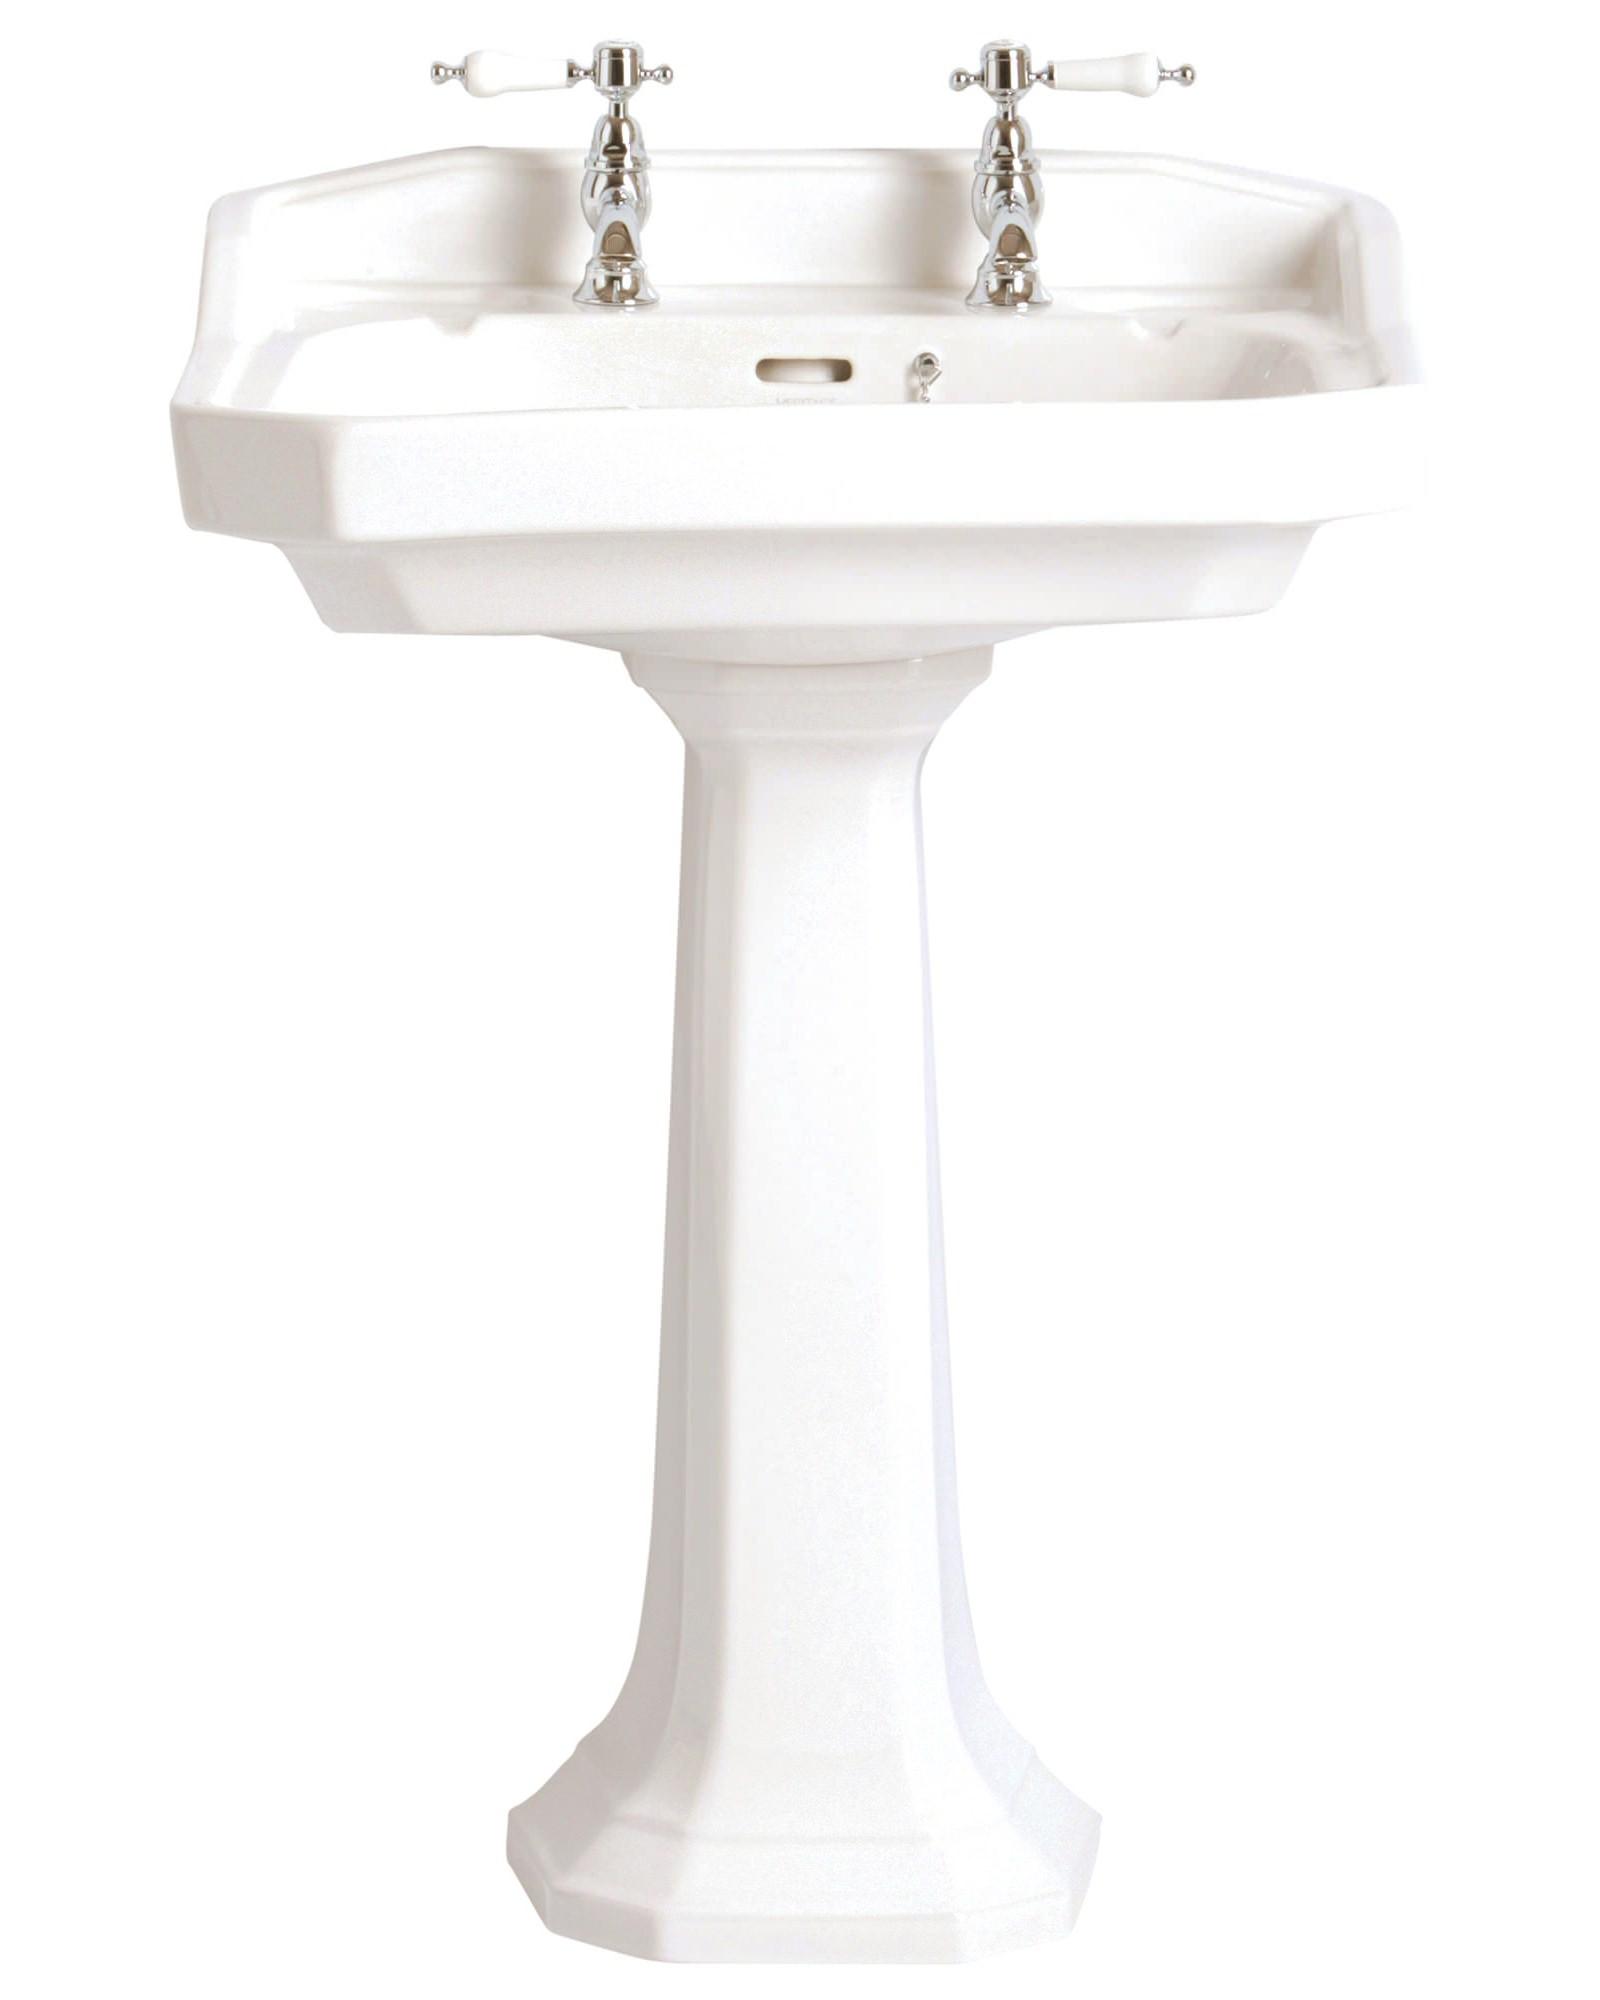 Traditional bathroom sink - Alternate Image Of Heritage Granley Traditional Bathroom Suite 2